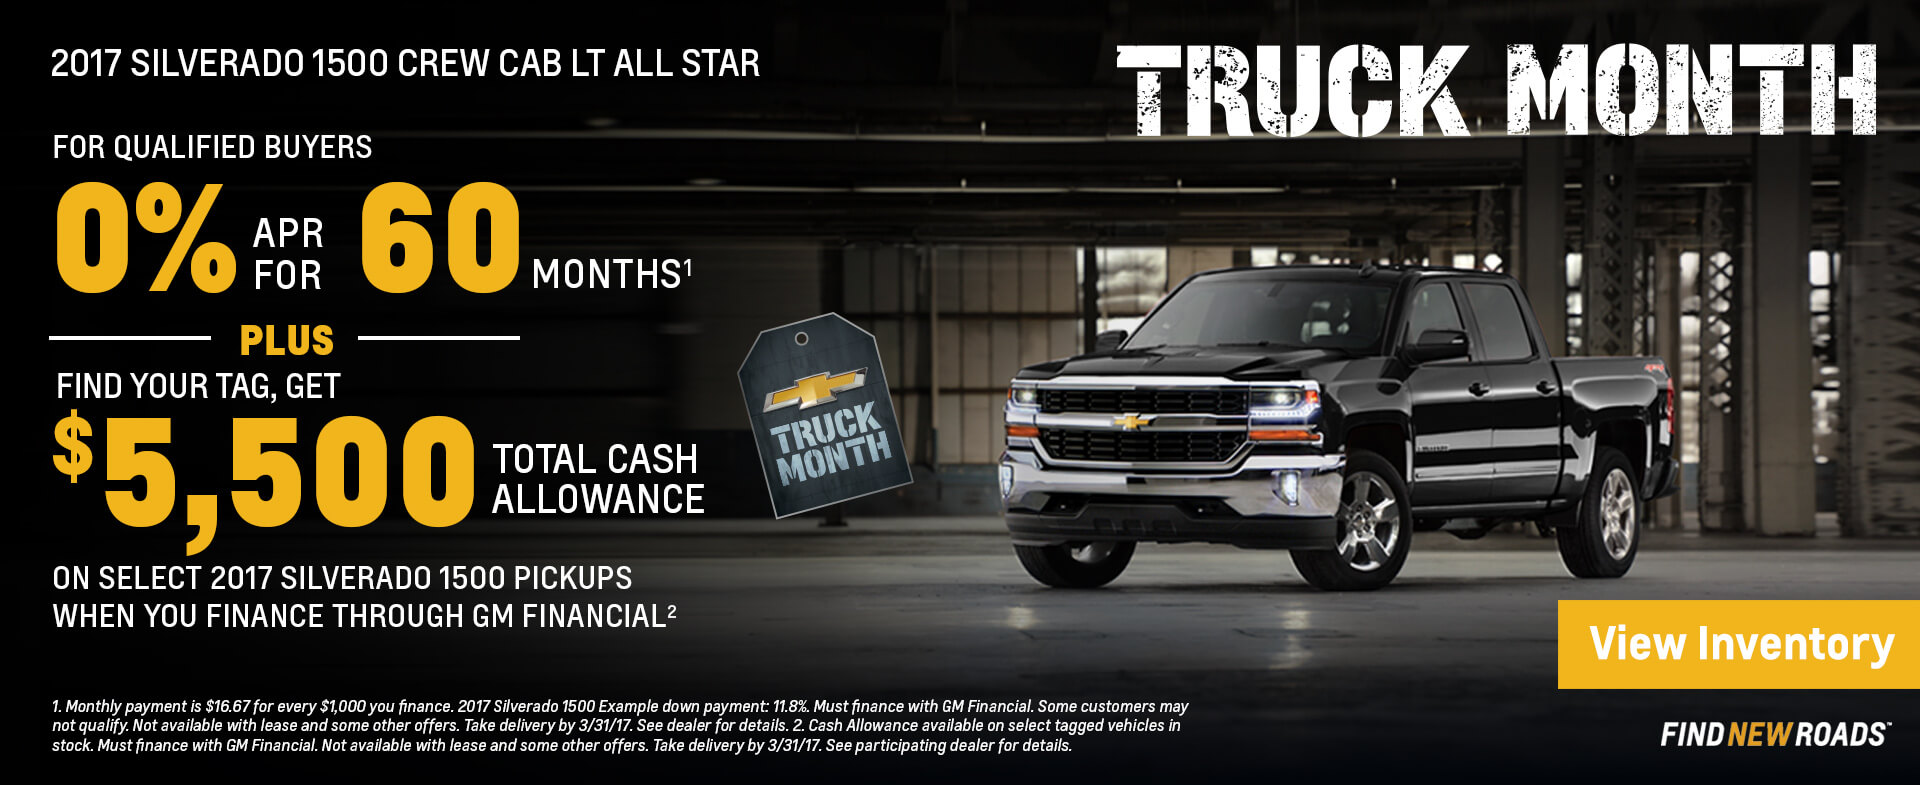 Truck month HP